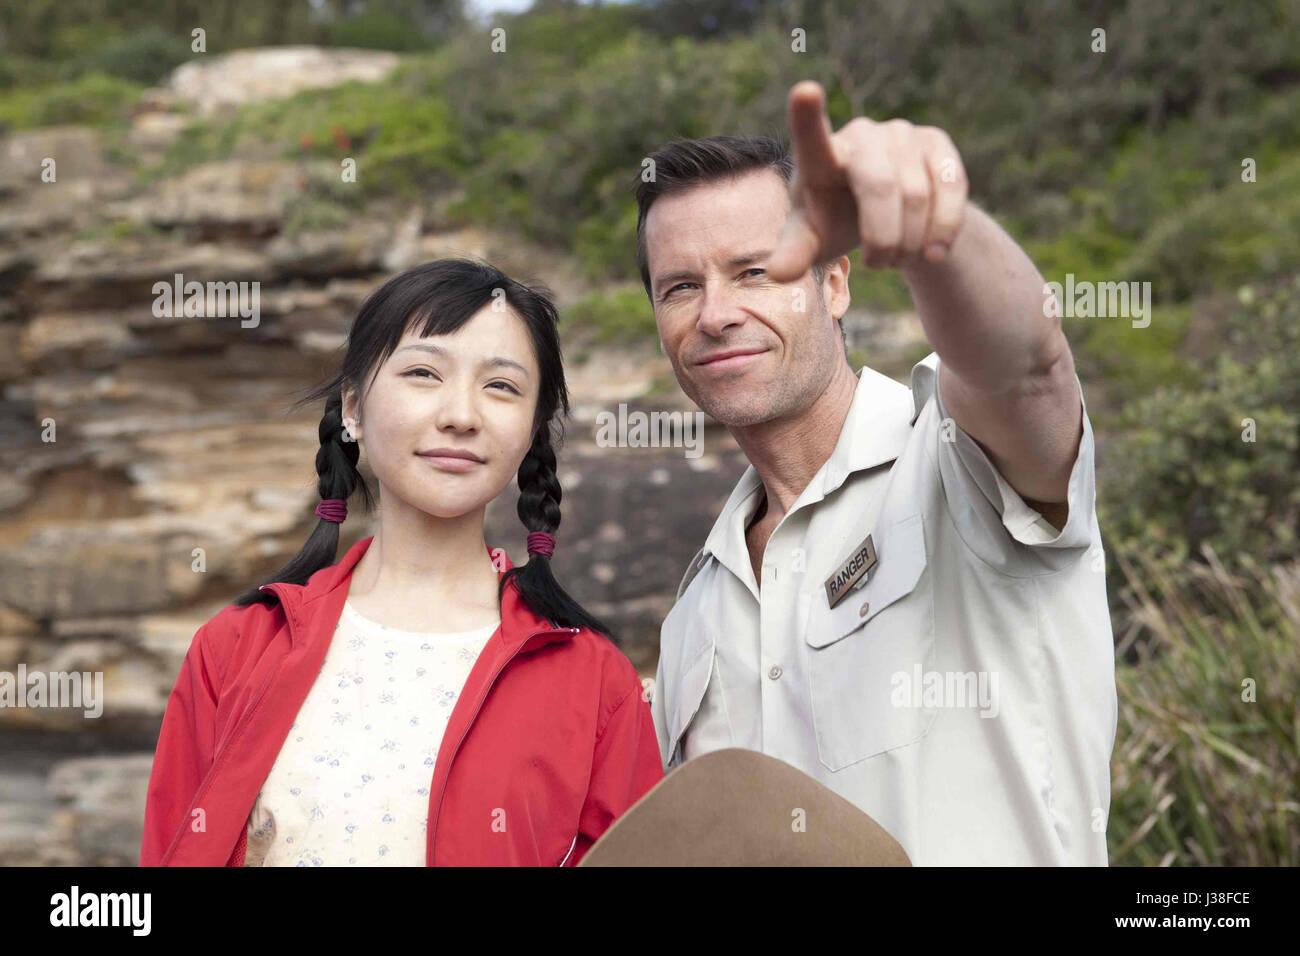 33 POSTCARDS (2011)  ZHU LIN  BUY PEARCE  PAULINE CHAN (DIR)  ARCLIGHT FILMS/MOVIESTORE COLLECTION LTD - Stock Image